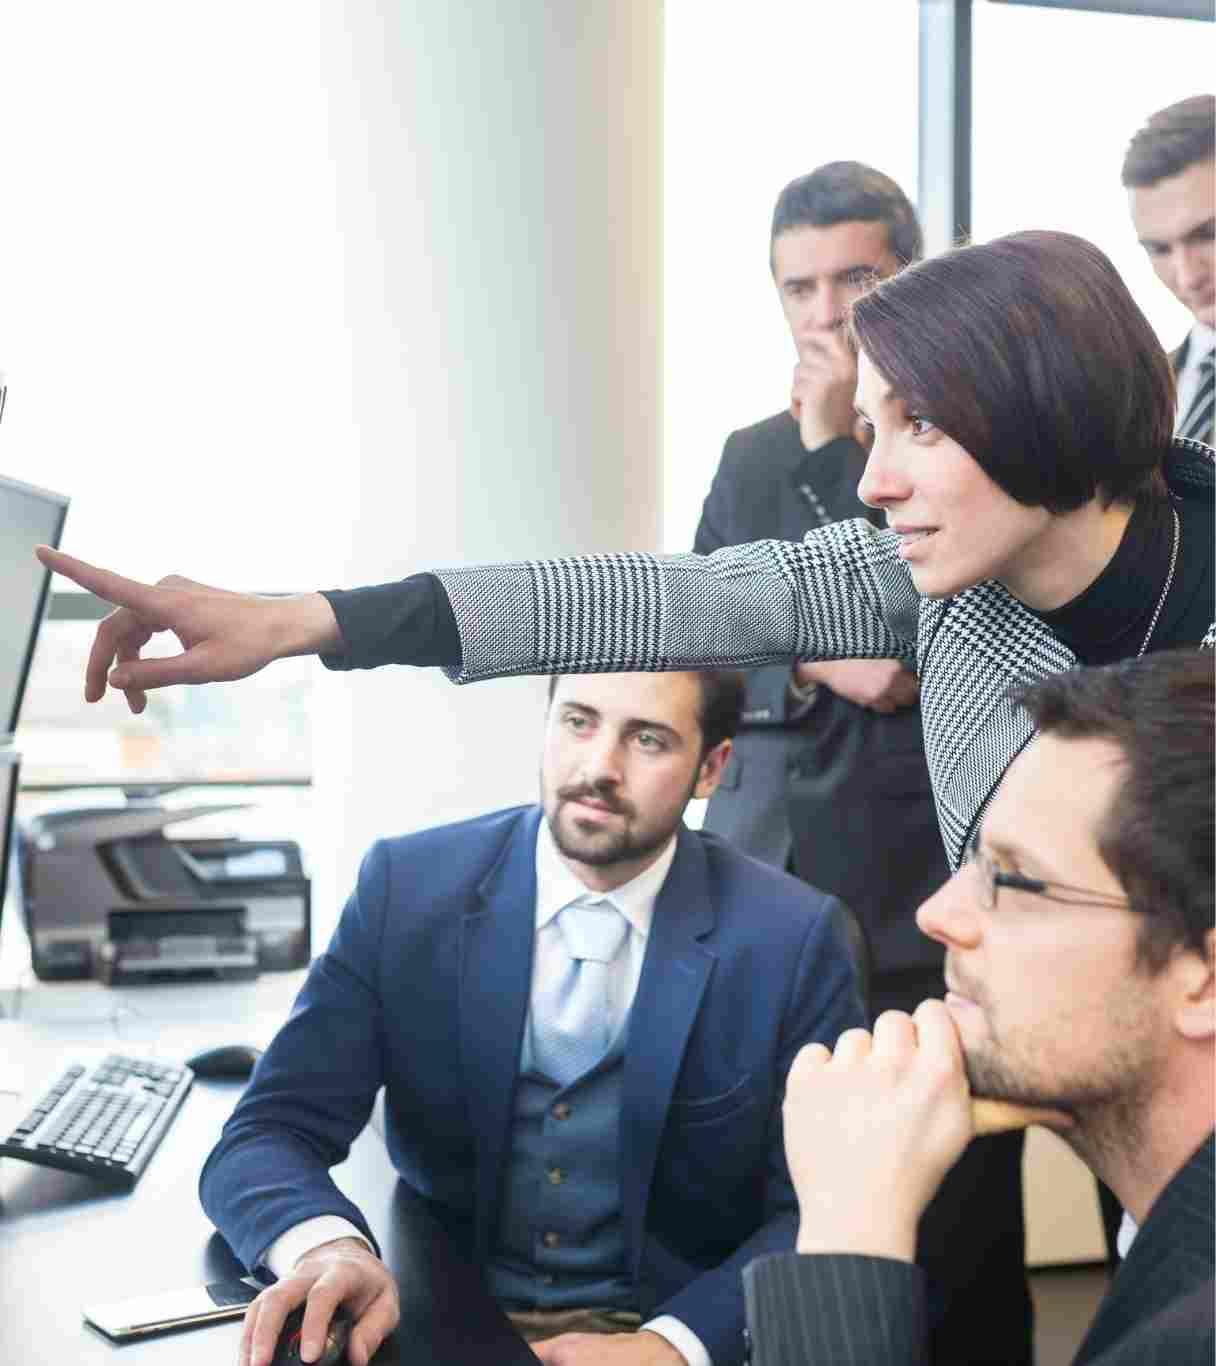 digital marketing agency consulting